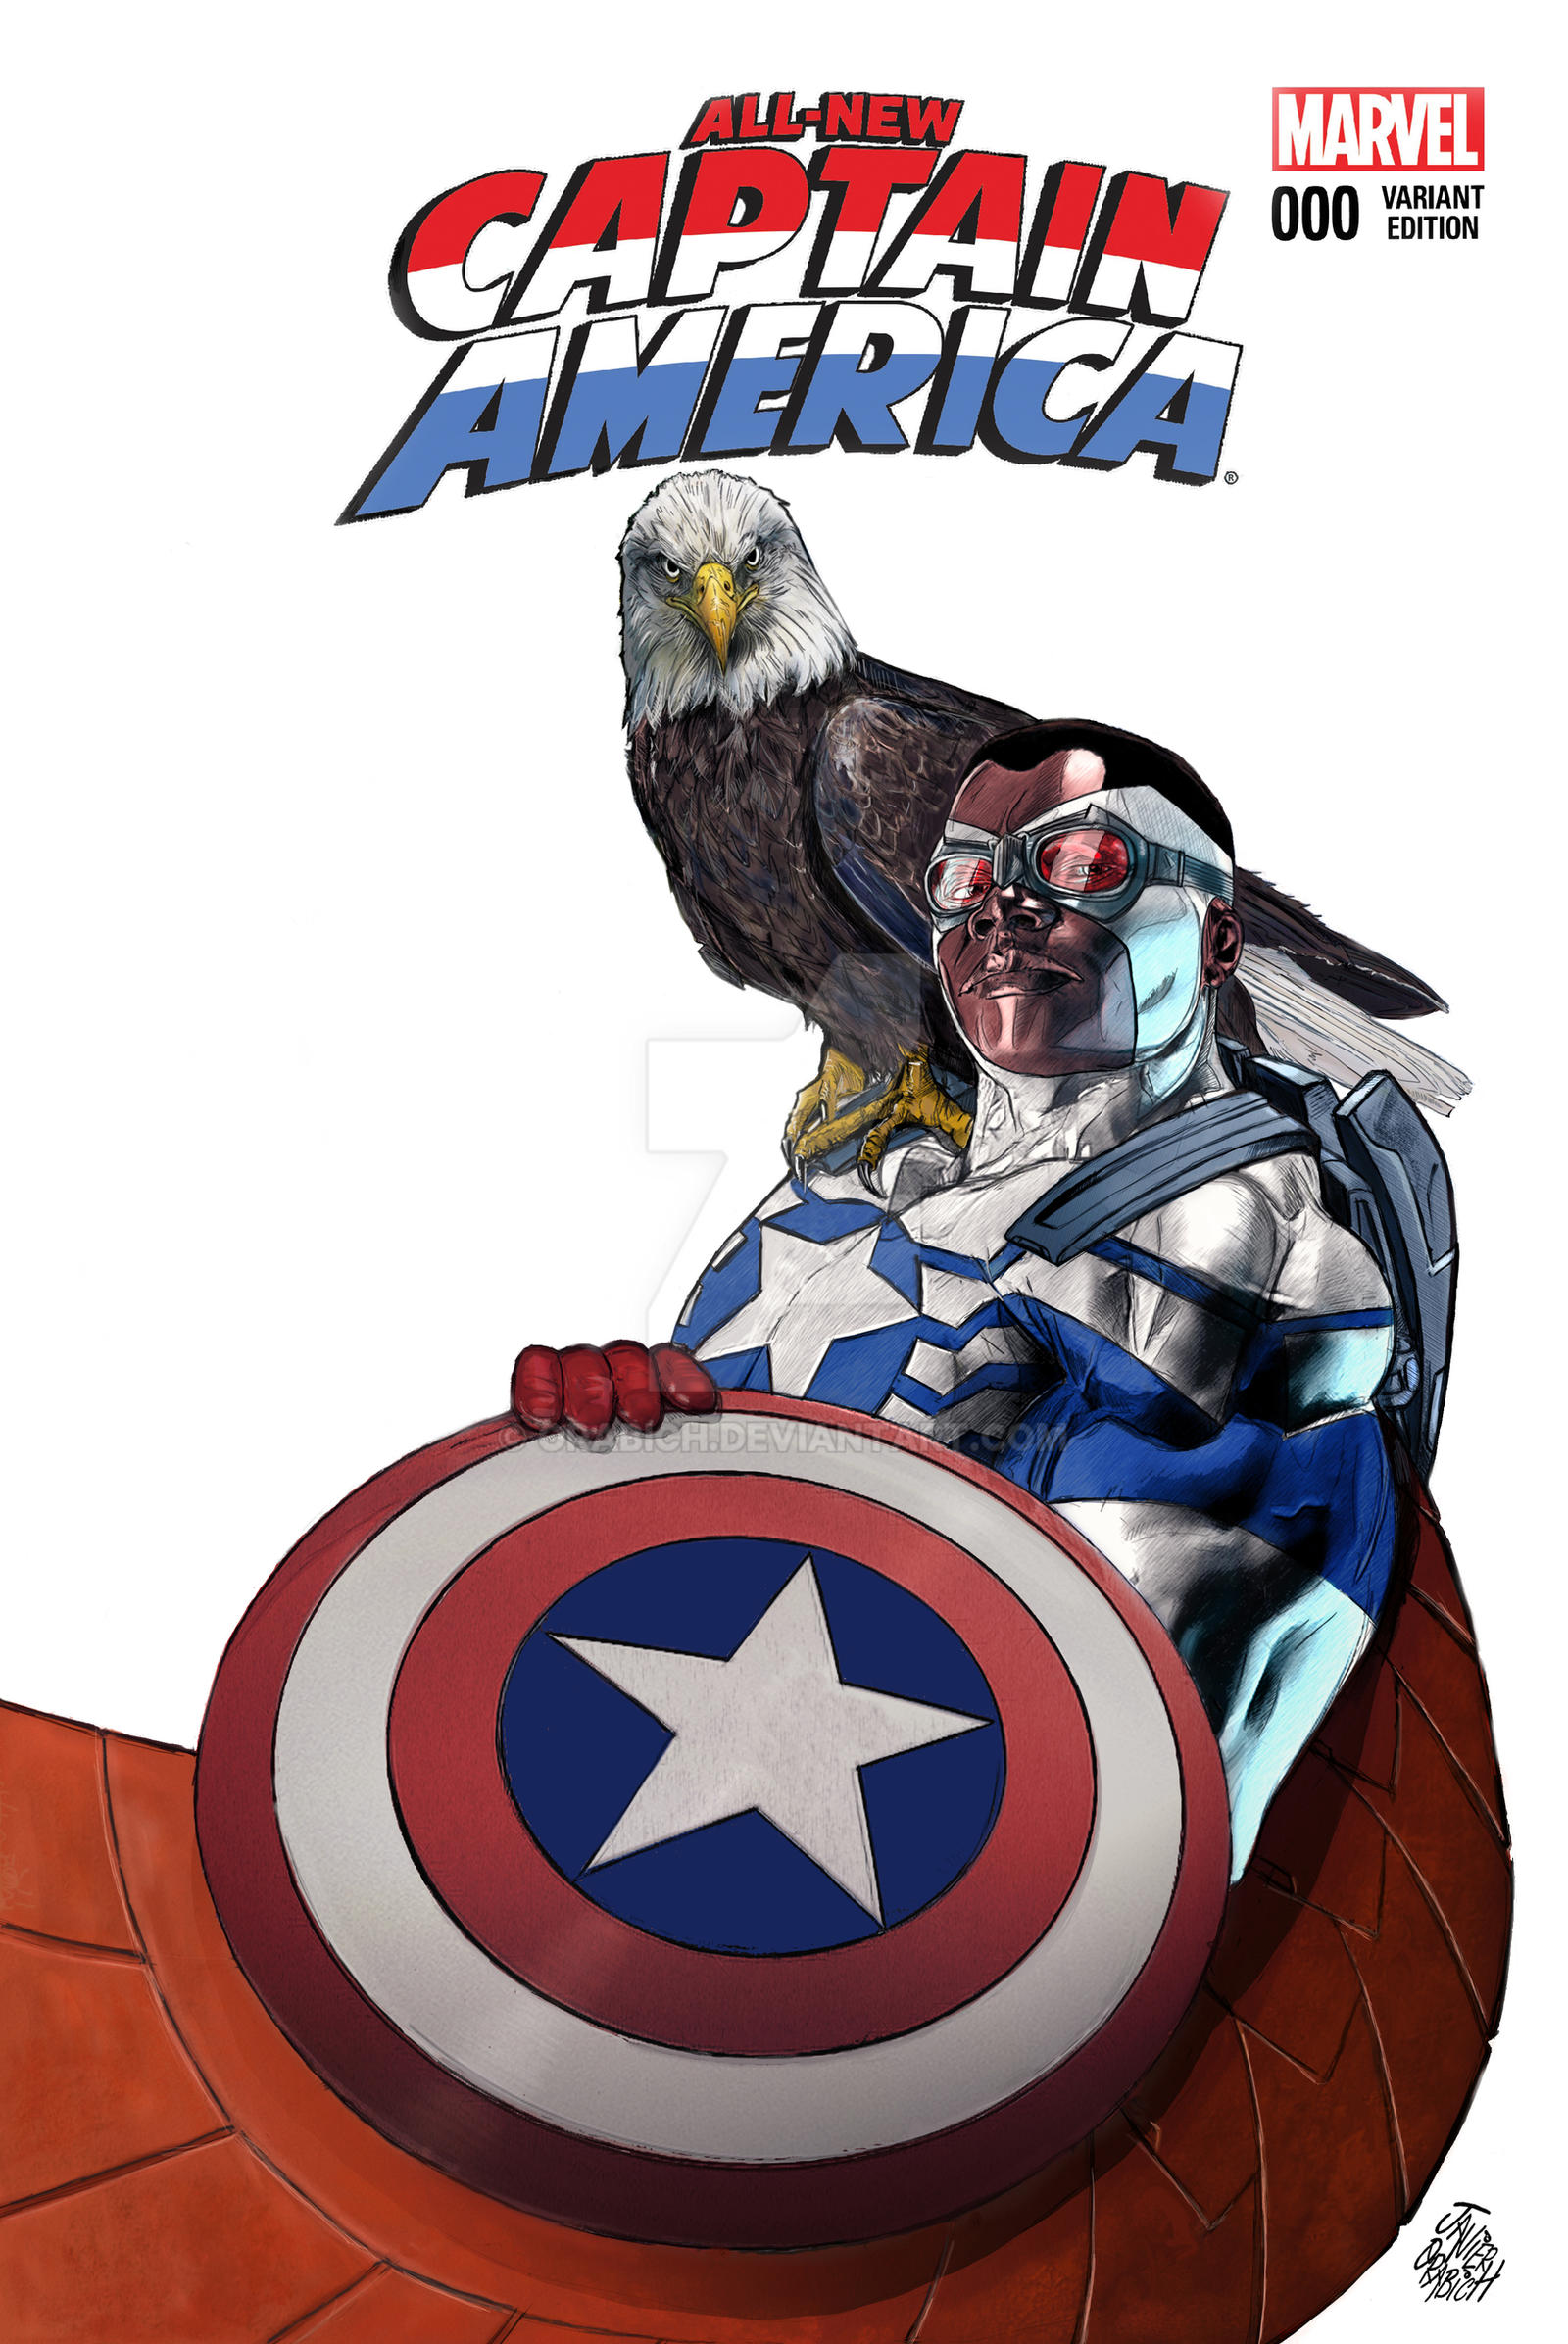 ALL-NEW CAPITAN AMERICA. by orabich